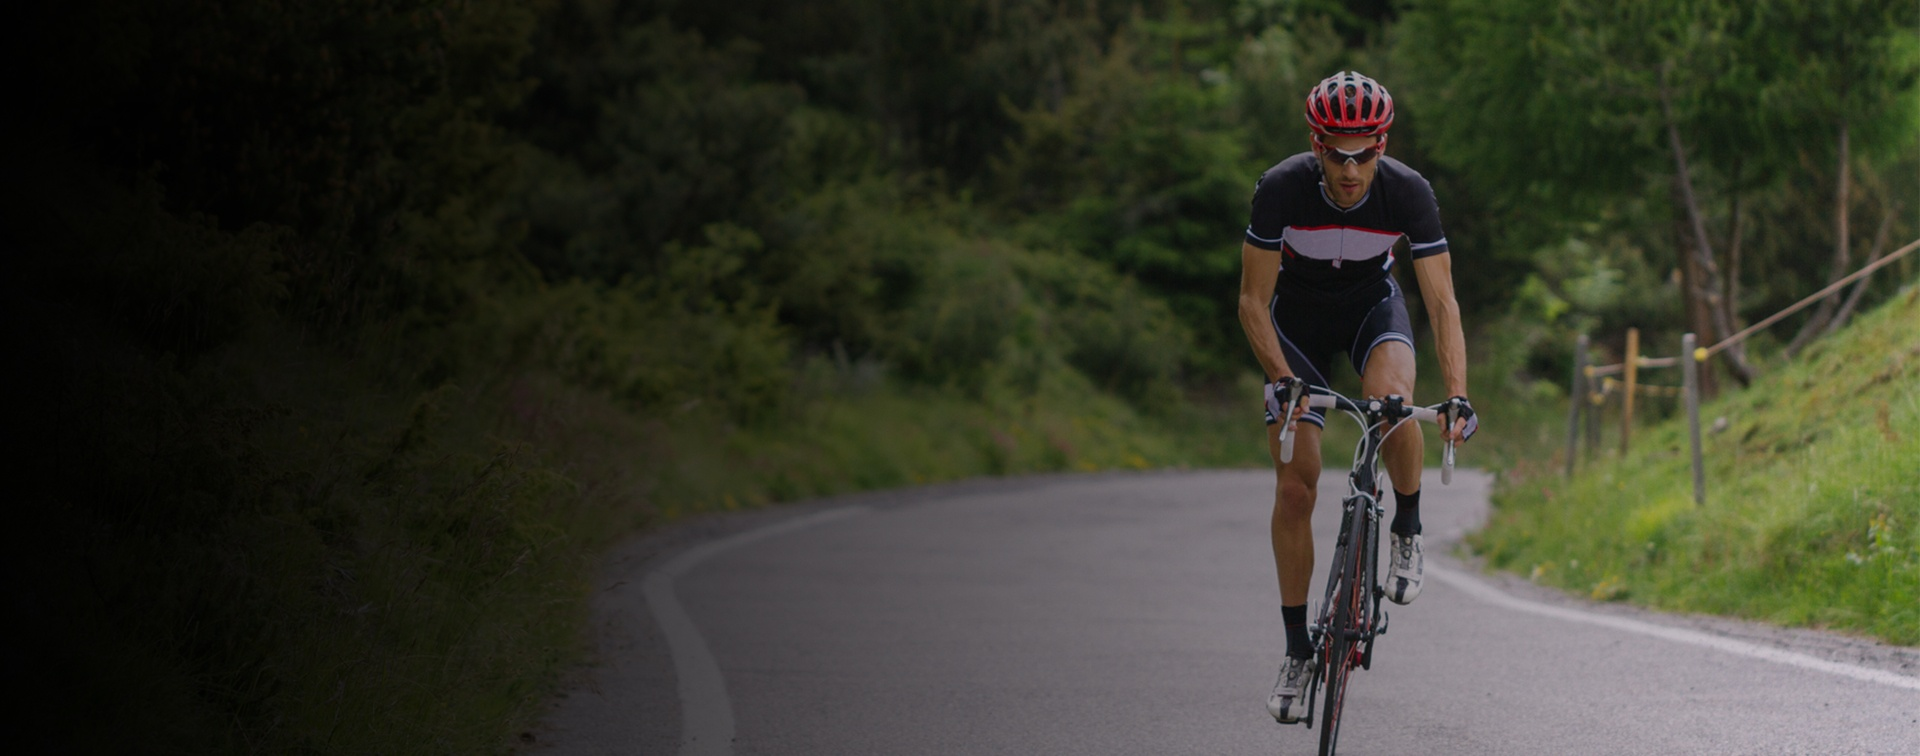 point2point_individual_rider_hero.jpg